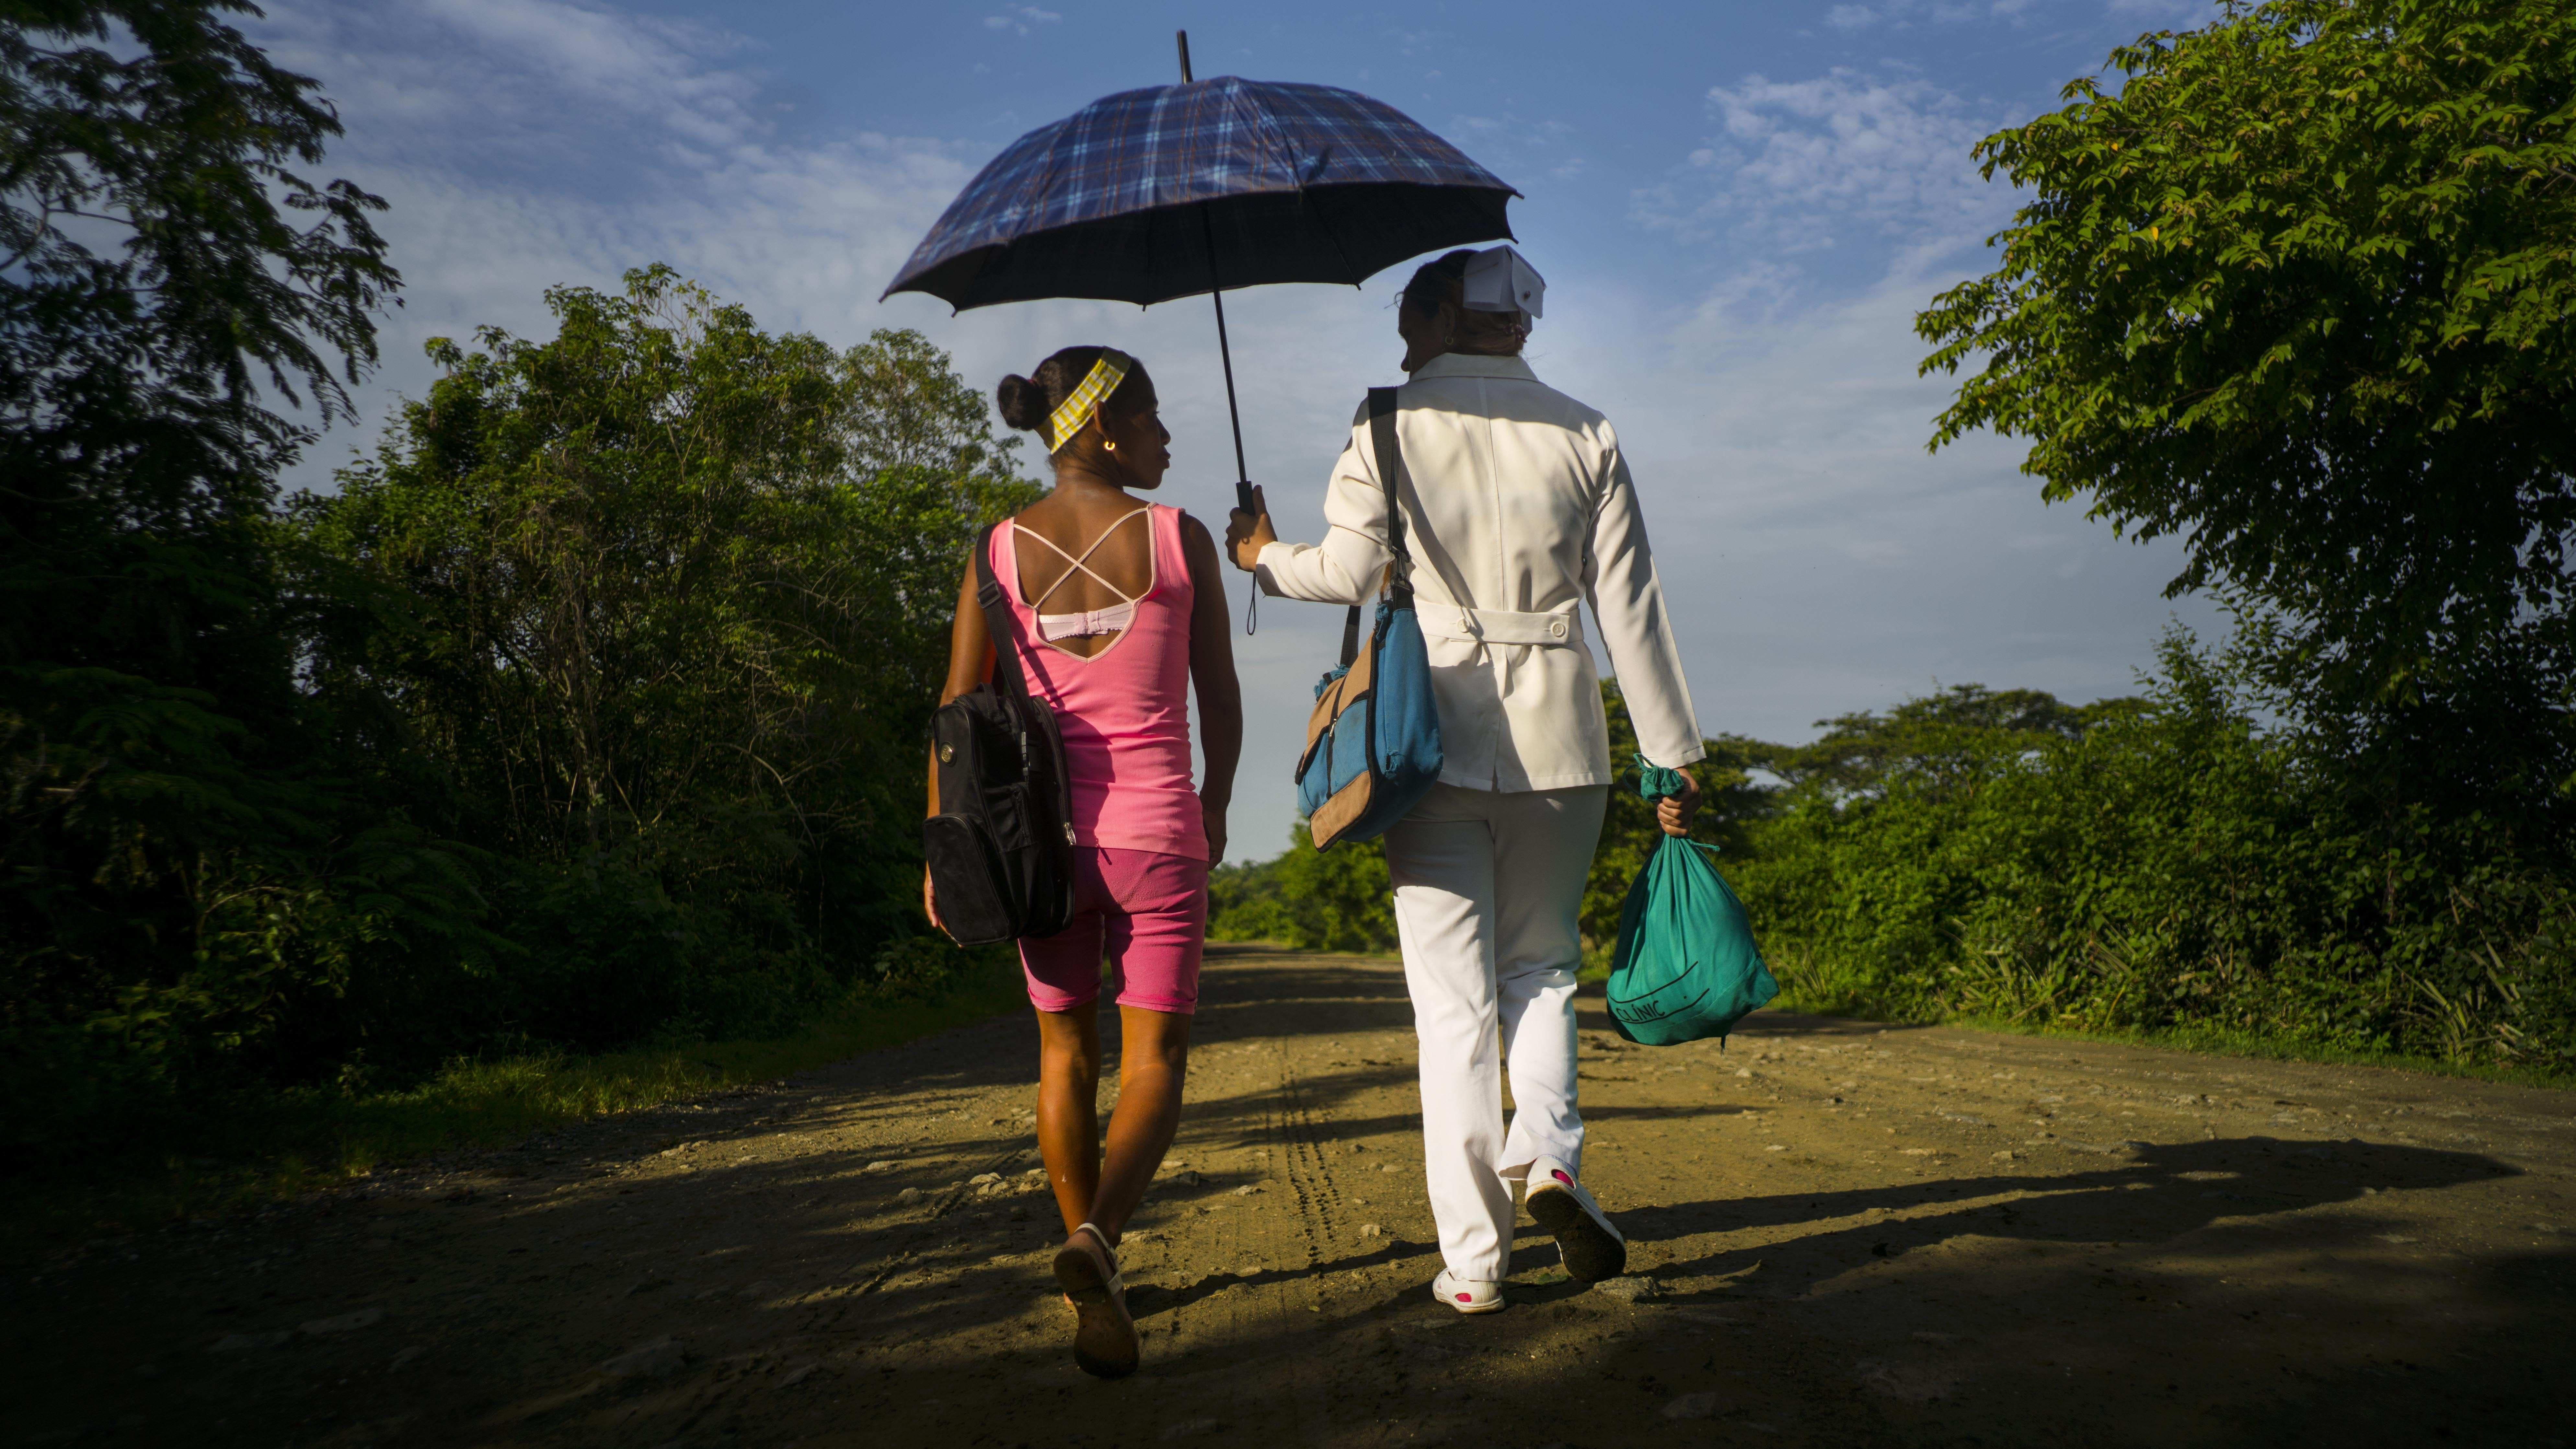 couple walking under an umbrella